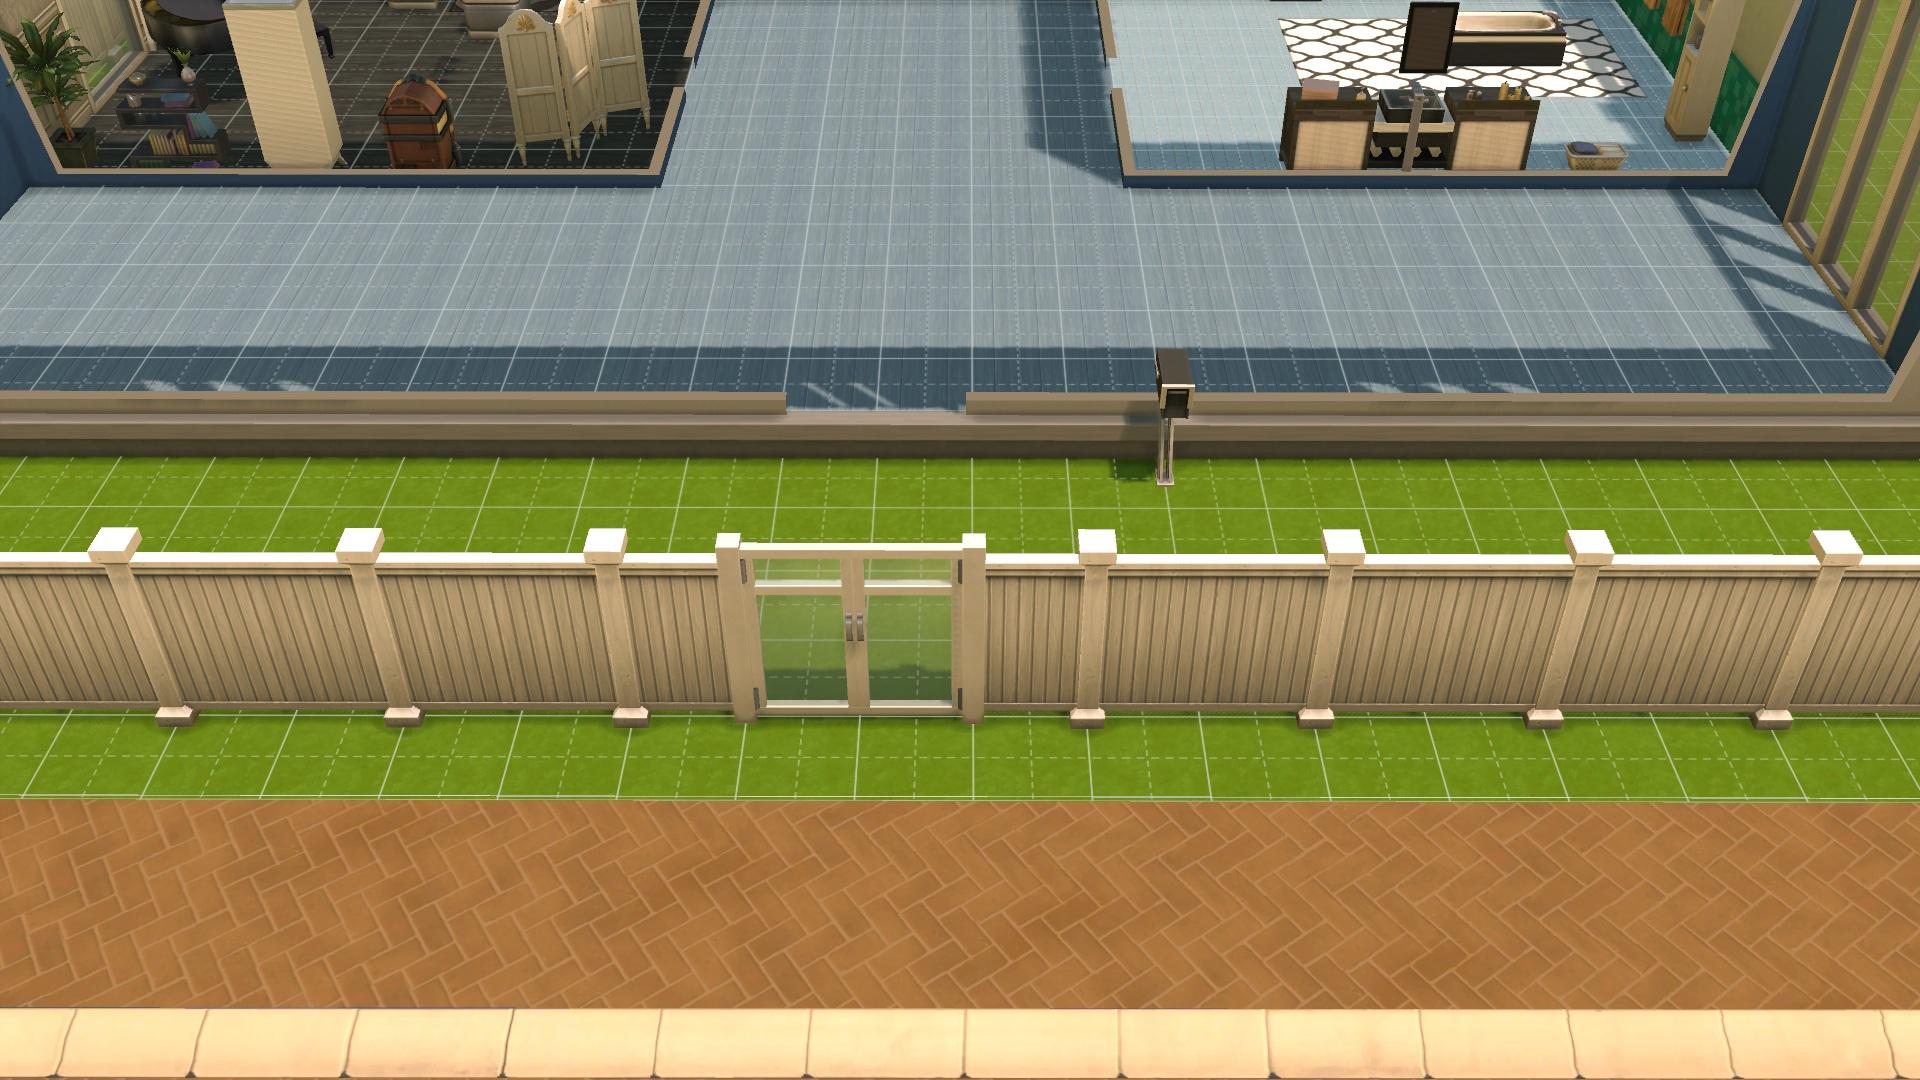 Les sims 4 construire sa maison 4 game guide for Construire une maison les sims 3